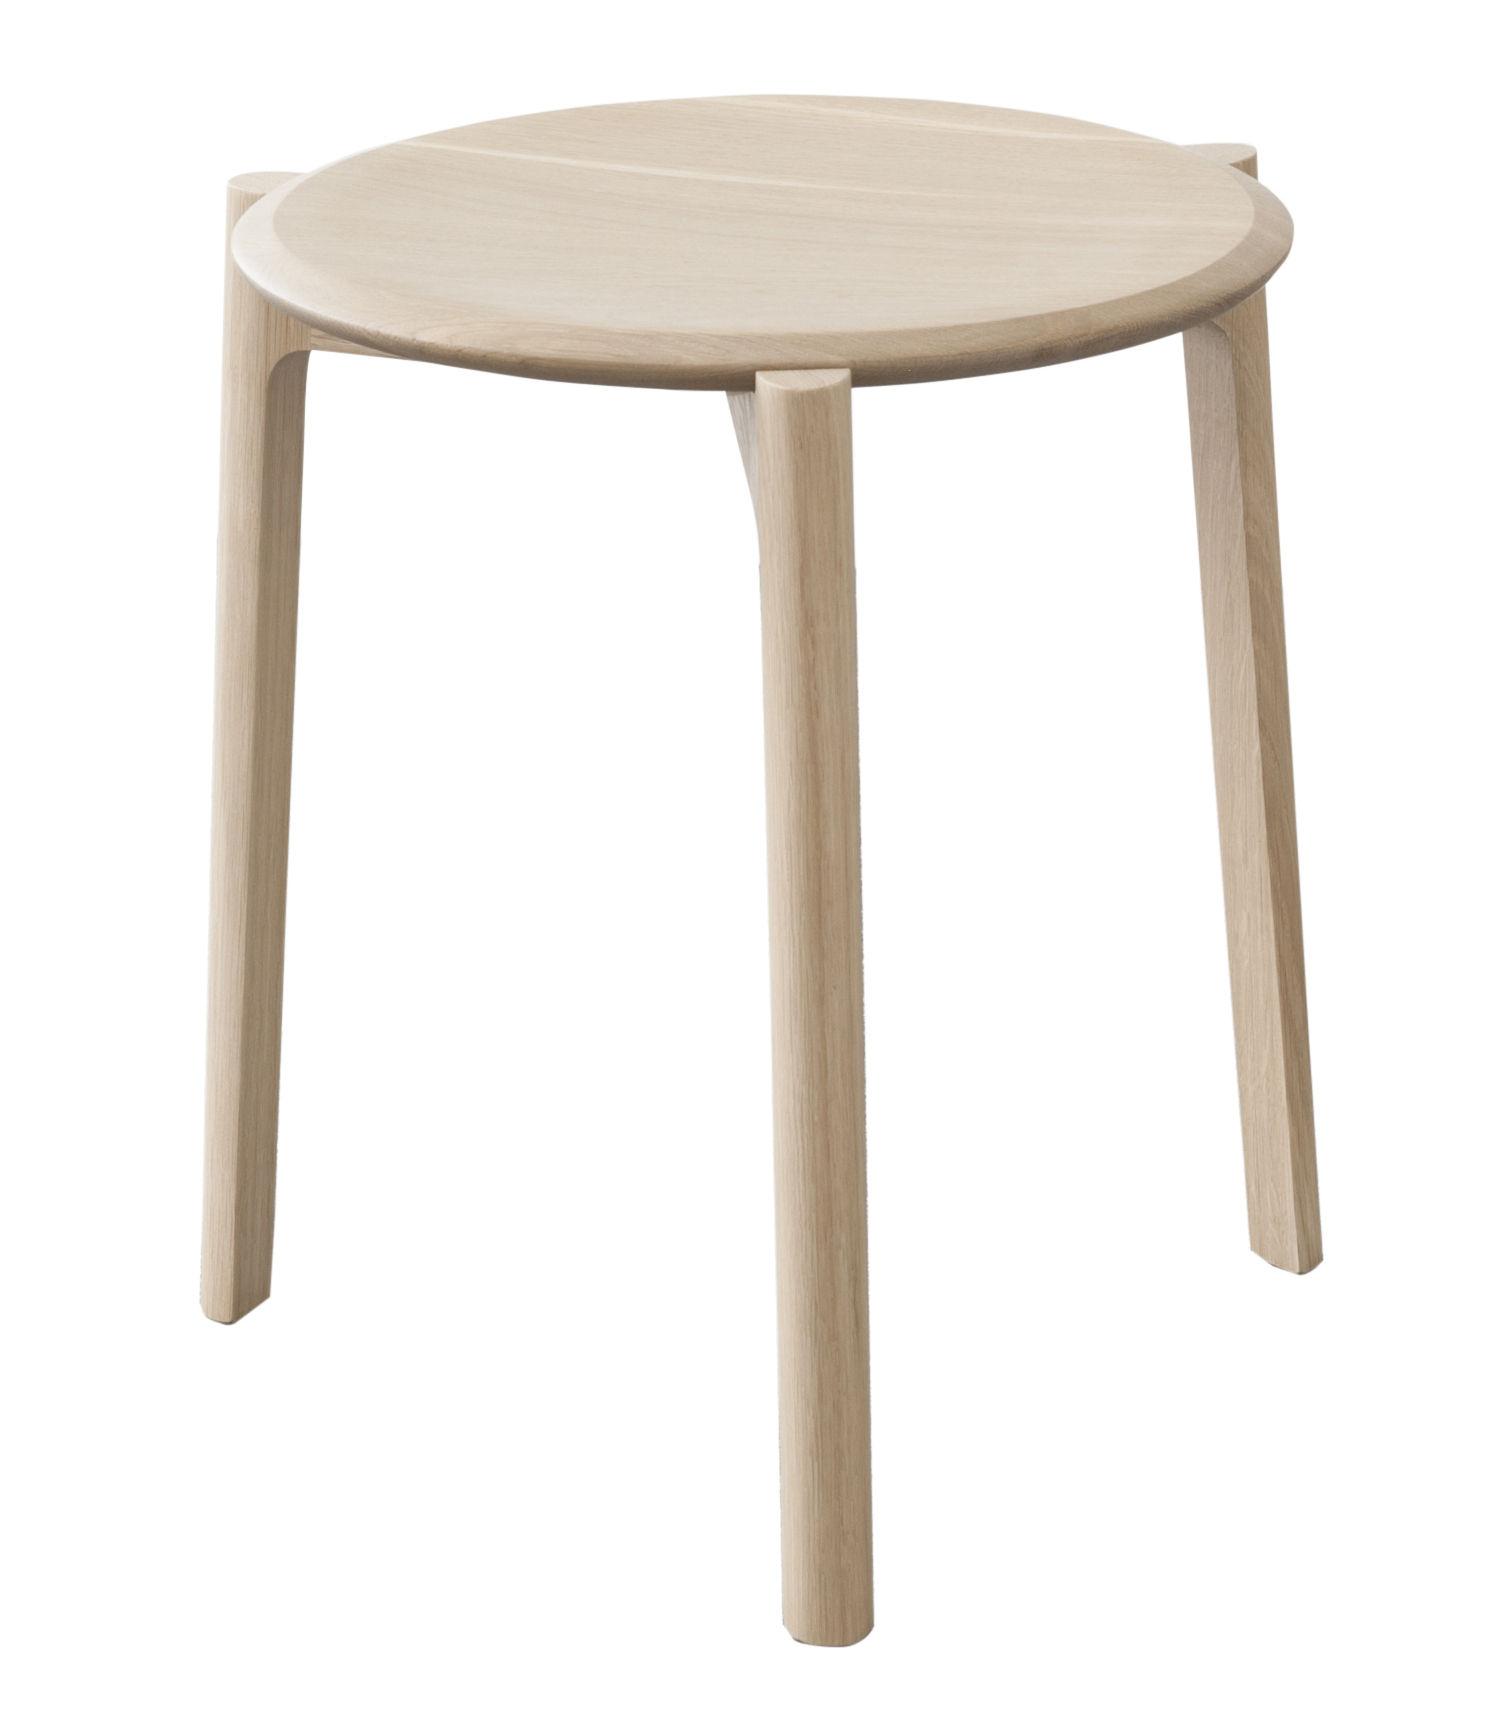 Furniture - Stools - Svelto Stackable stool - Wood / H 45 cm by Ercol - Oak - Solid oak